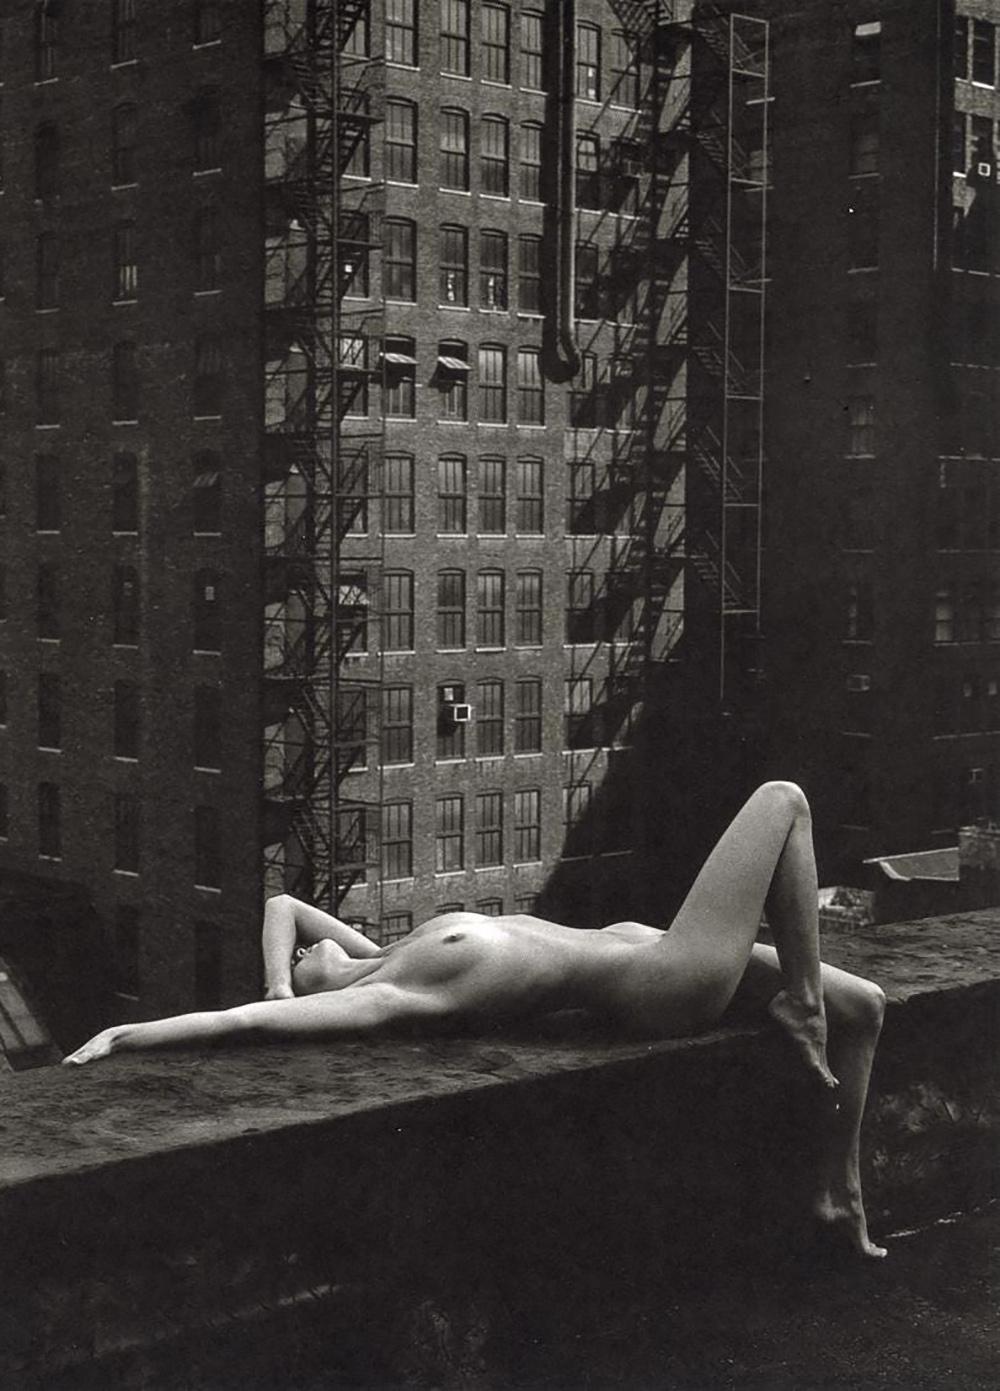 PATRICK DEMARCHELIER - NUDE, NEW YORK, 1975